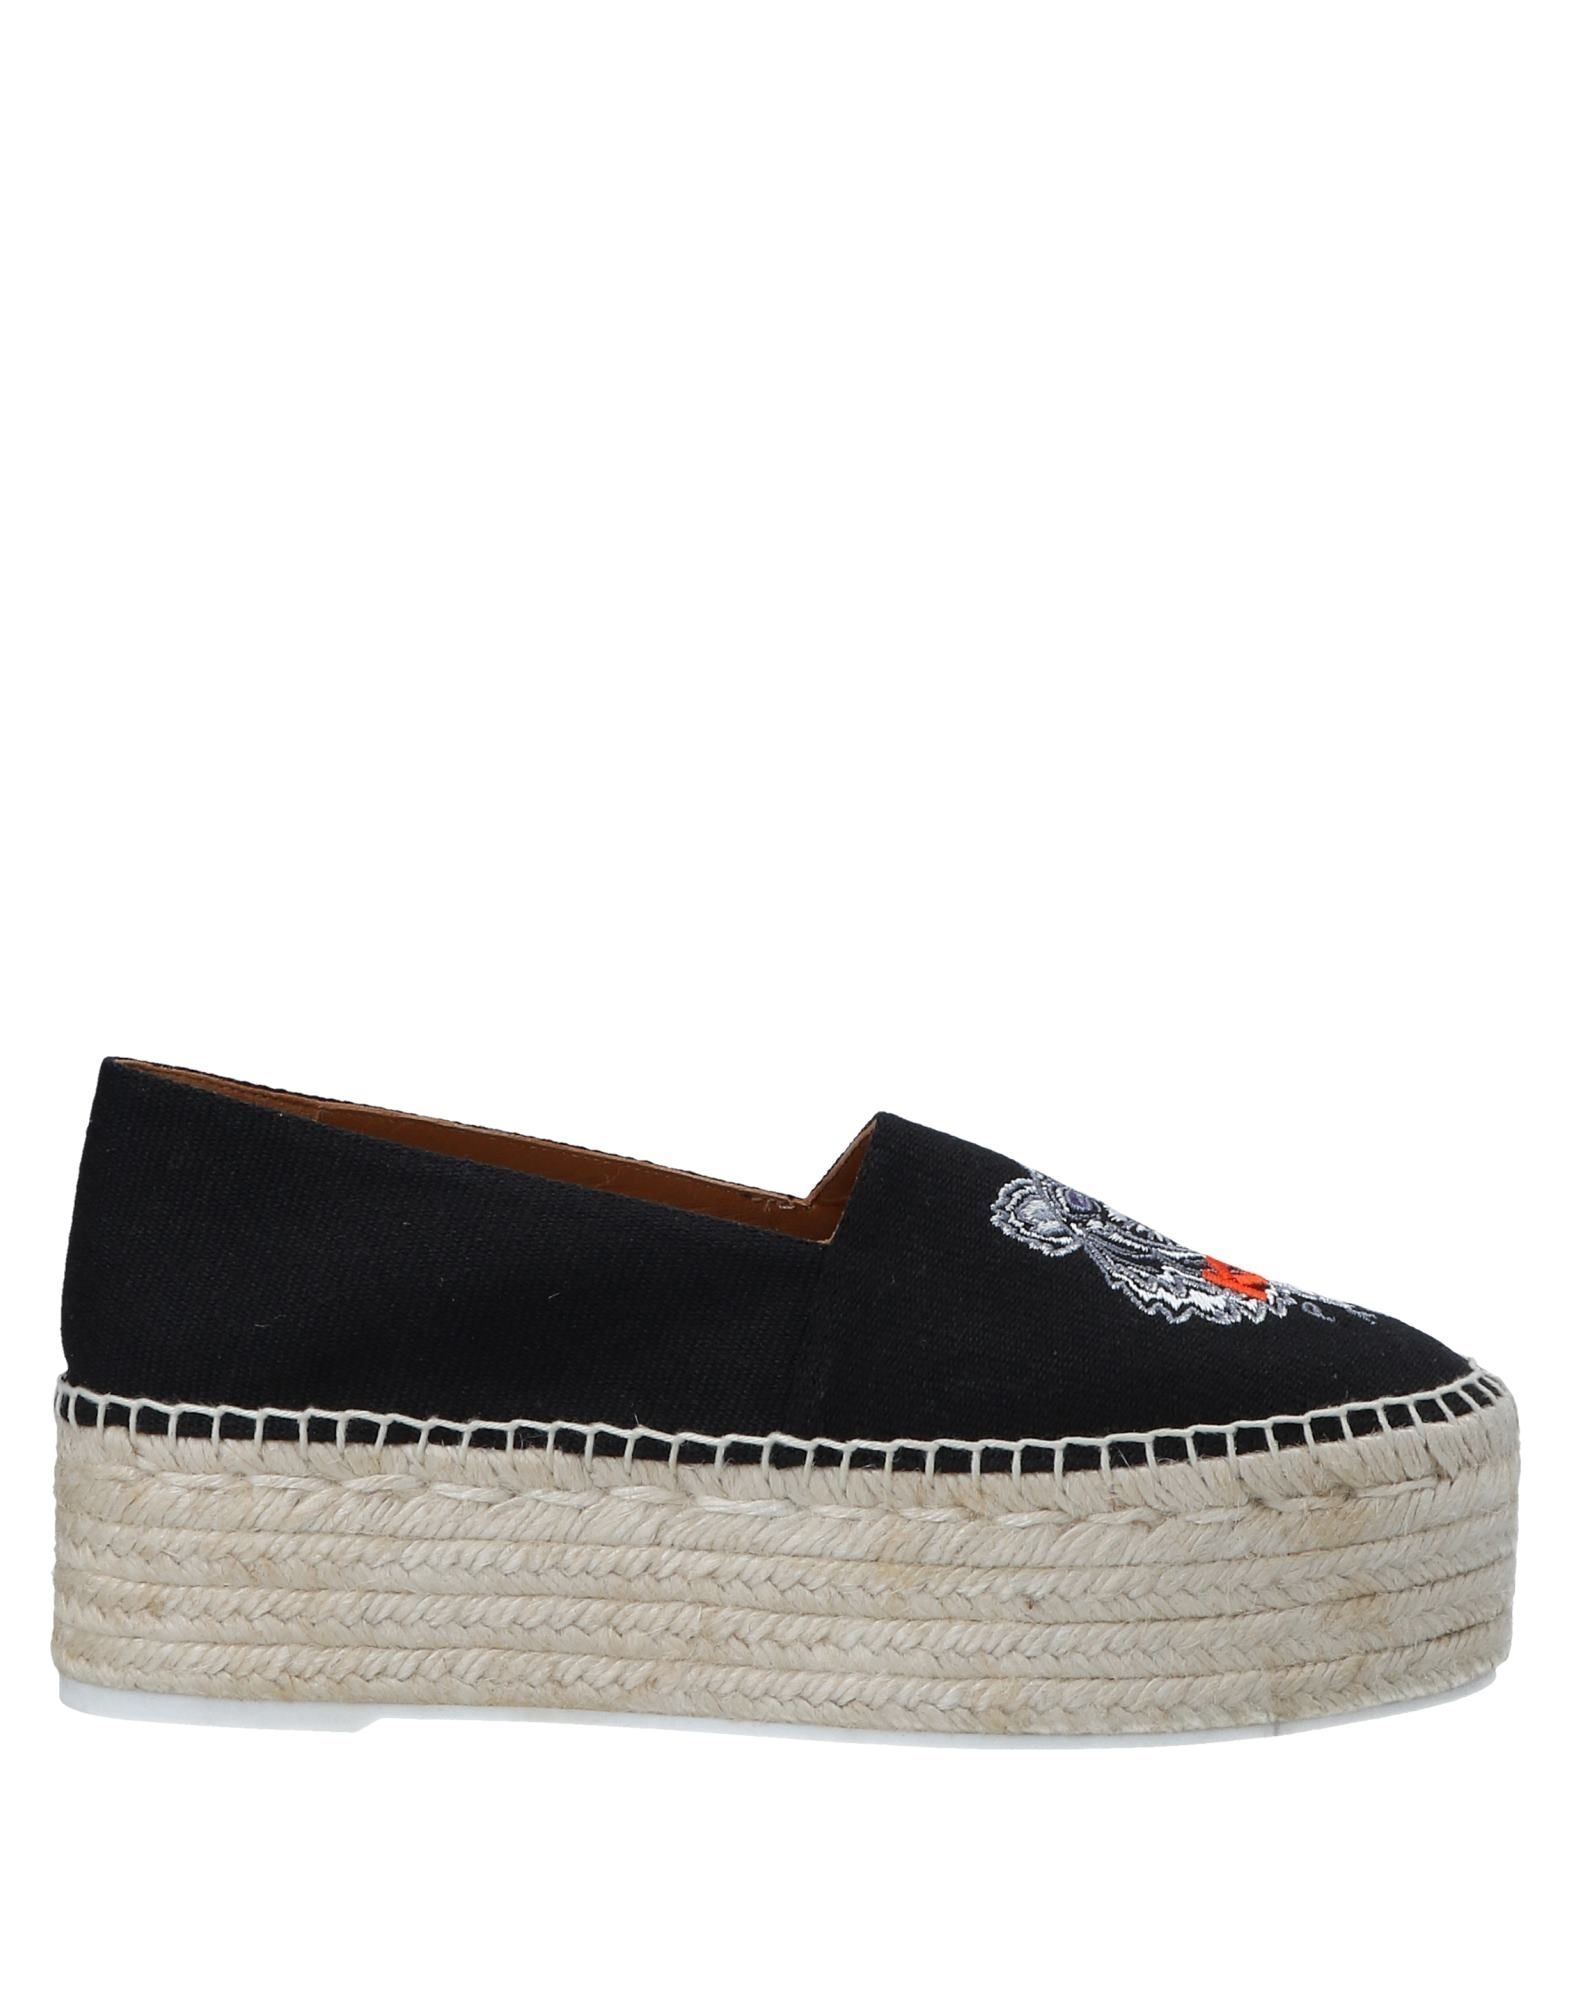 Stilvolle billige Schuhe Kenzo Espadrilles Damen  11551601LJ